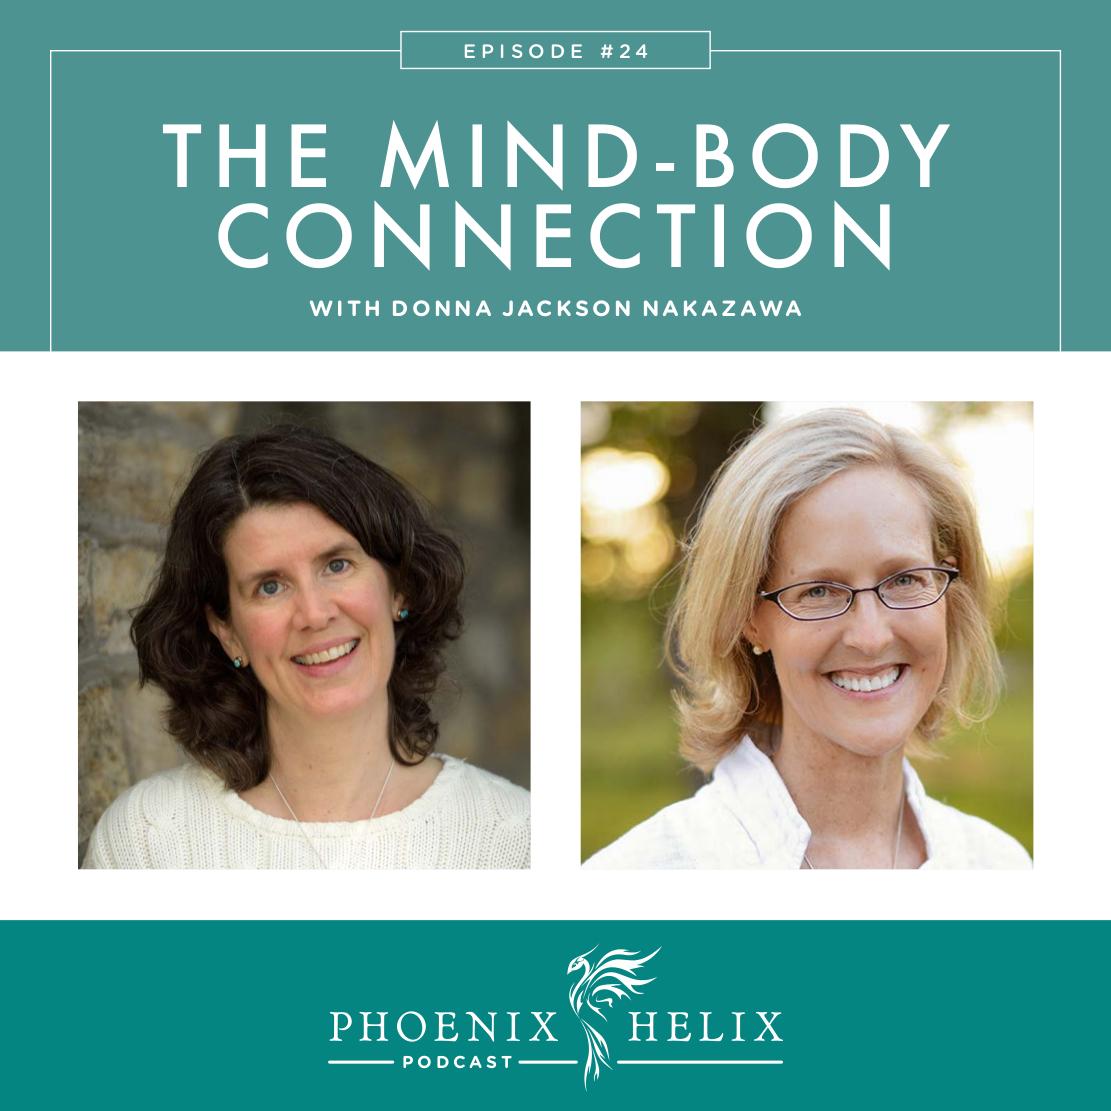 The Mind-Body Connection with Donna Jackson Nakazawa | Phoenix Helix Podcast